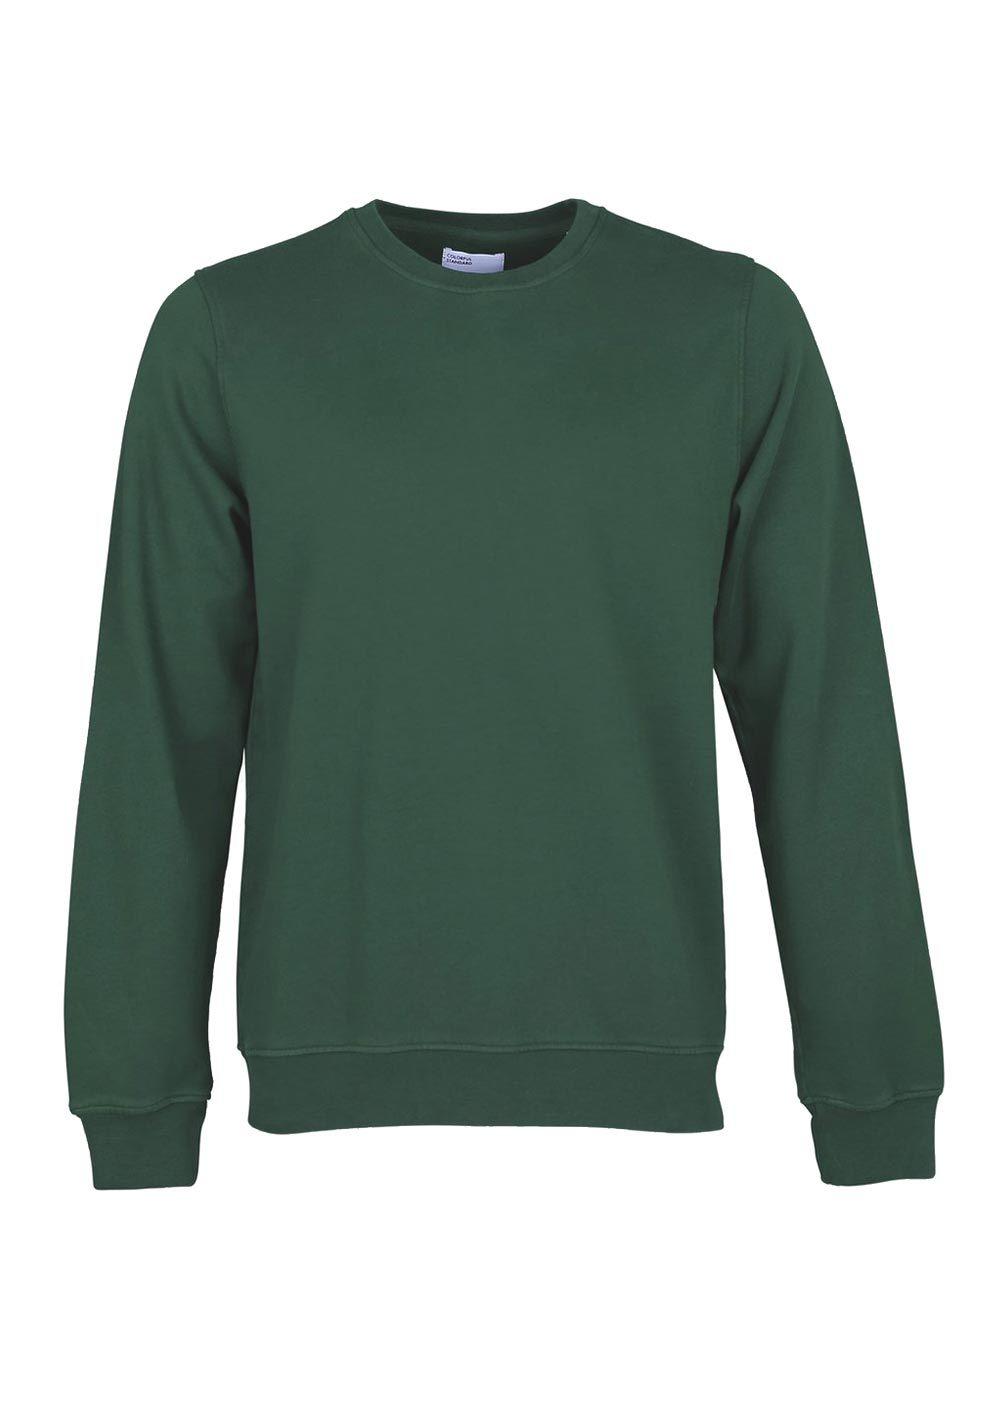 Colorful Standard COLORFUL STANDARD classic organic crew neck sweater emerald green (unisex)